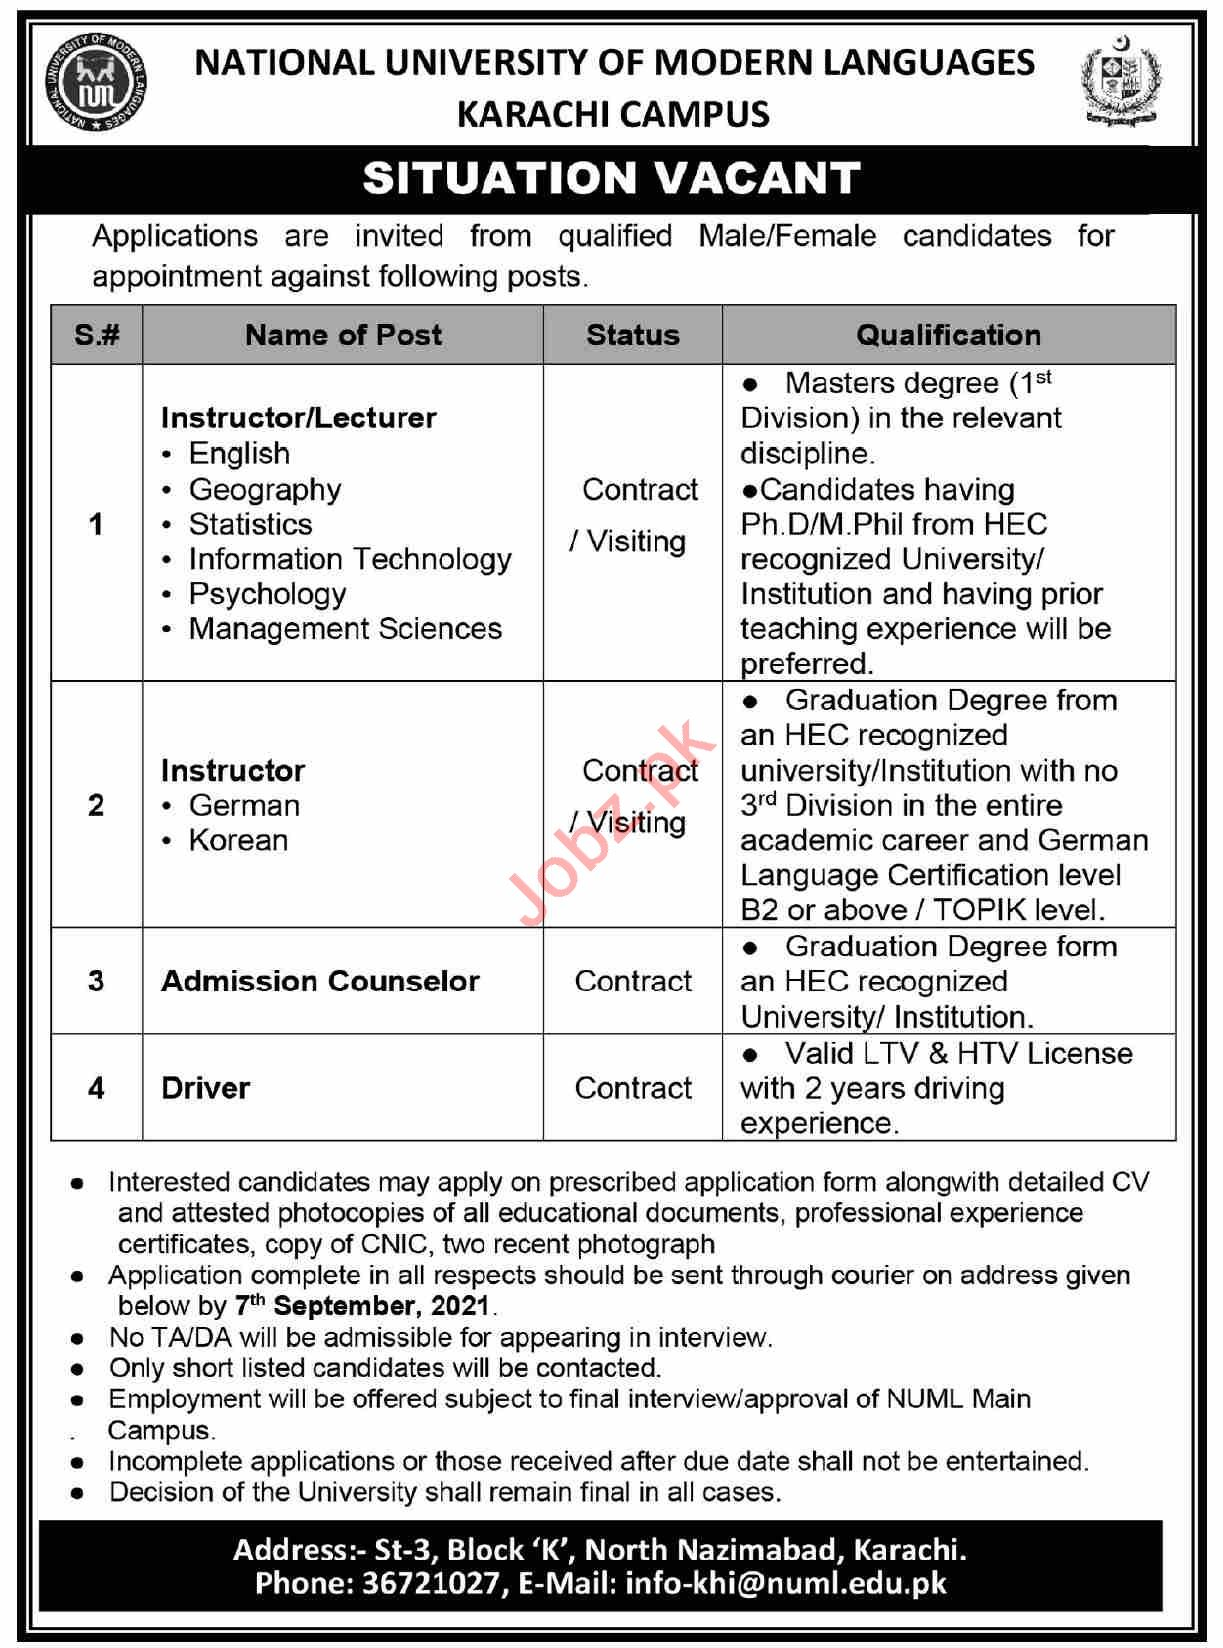 NUML University Karachi Campus Jobs 2021 for Lecturers